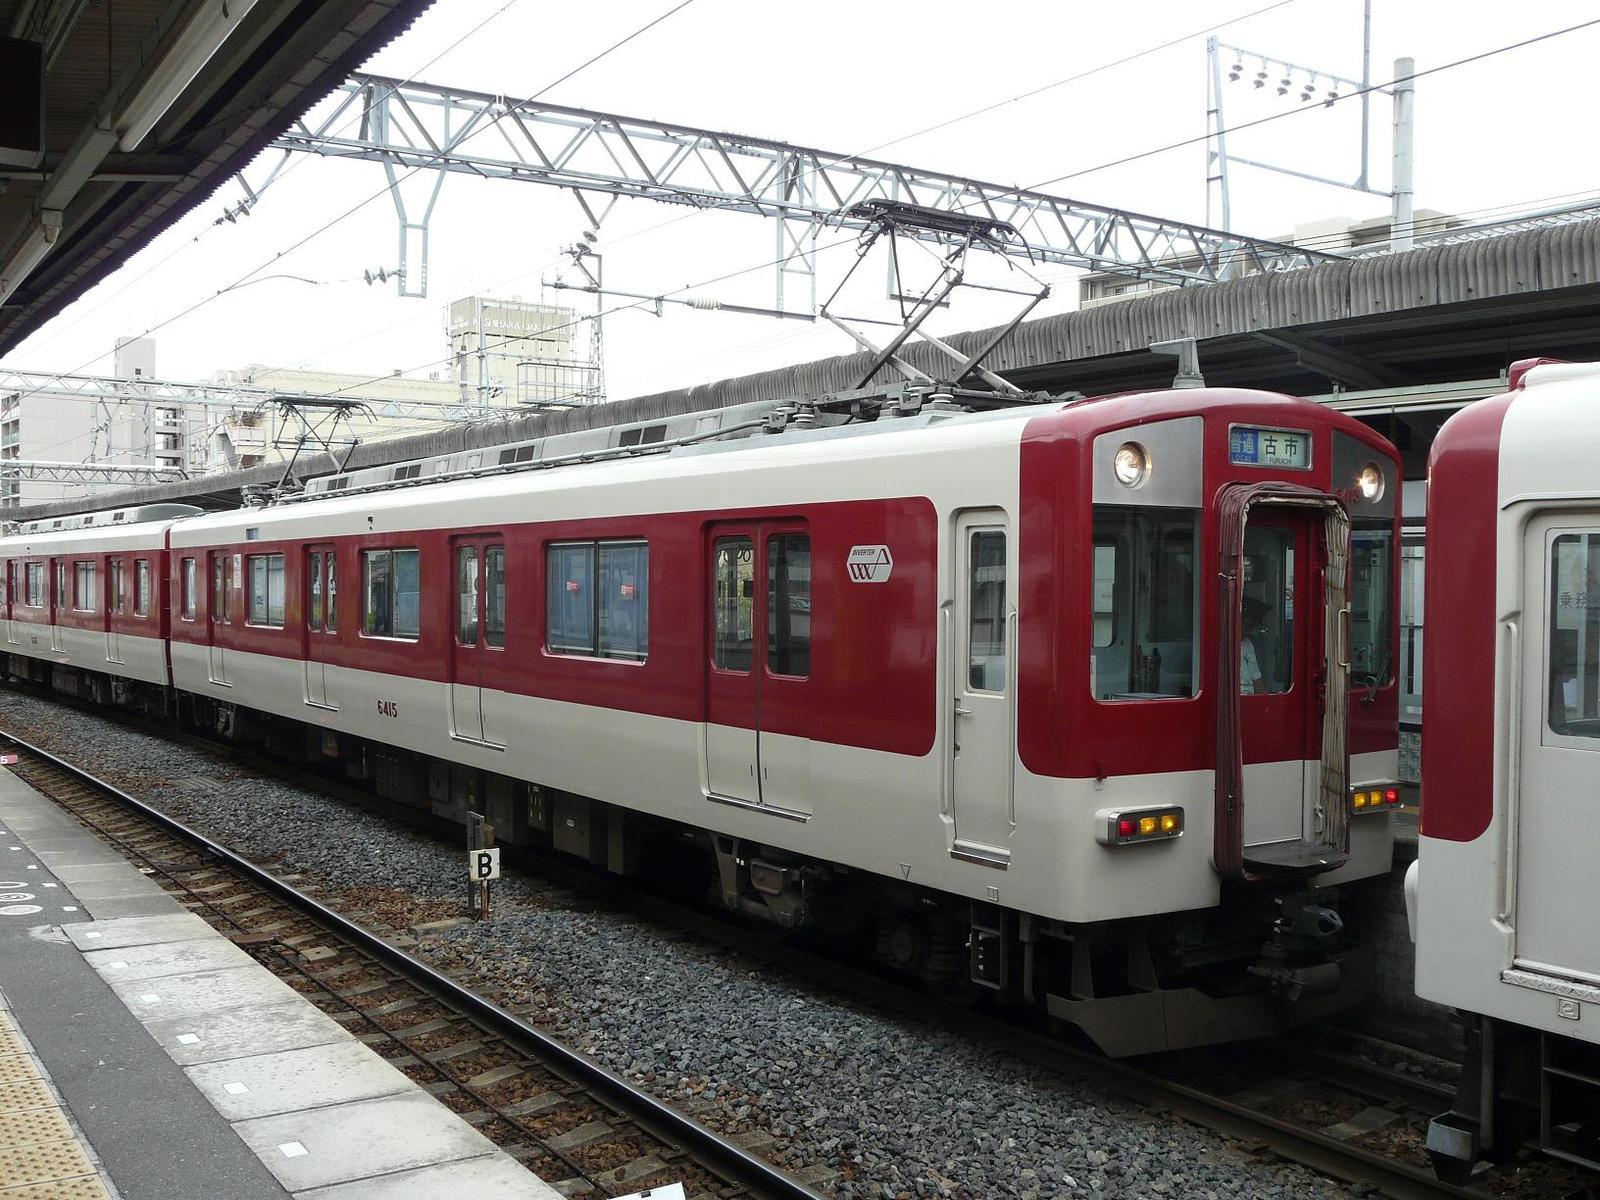 P1040668